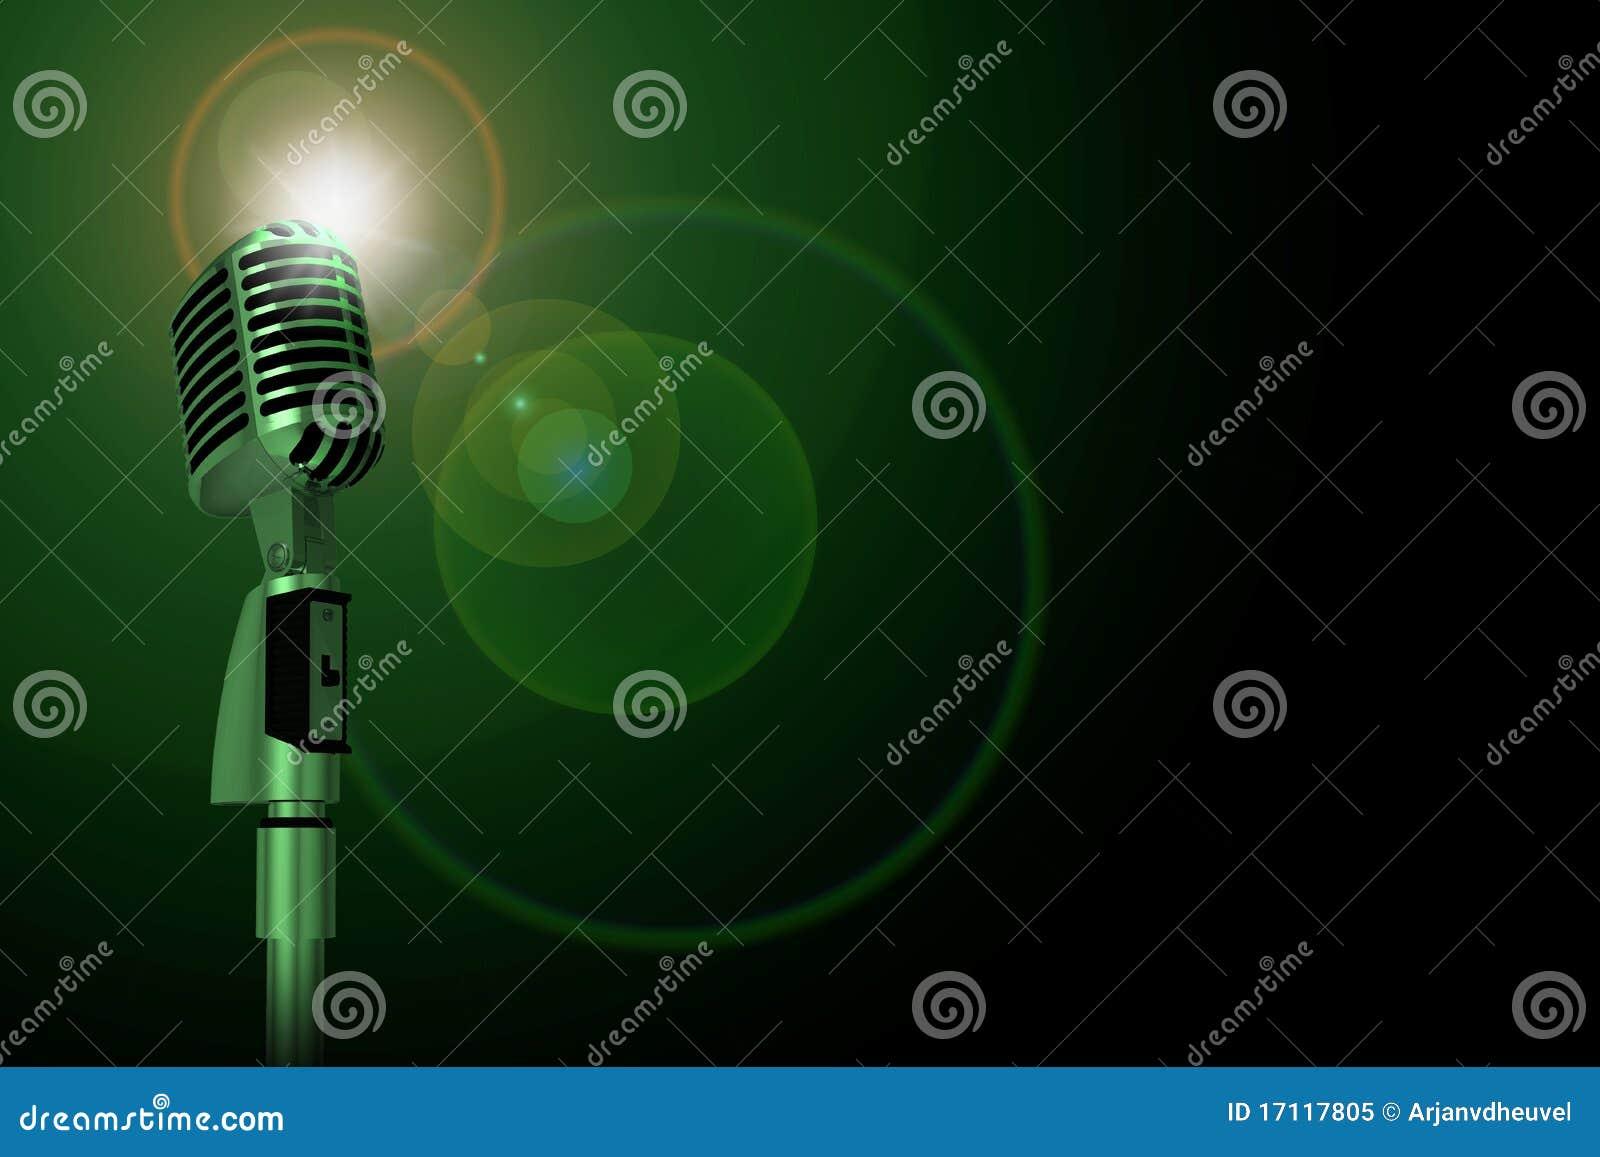 Classic microphone, green lighting